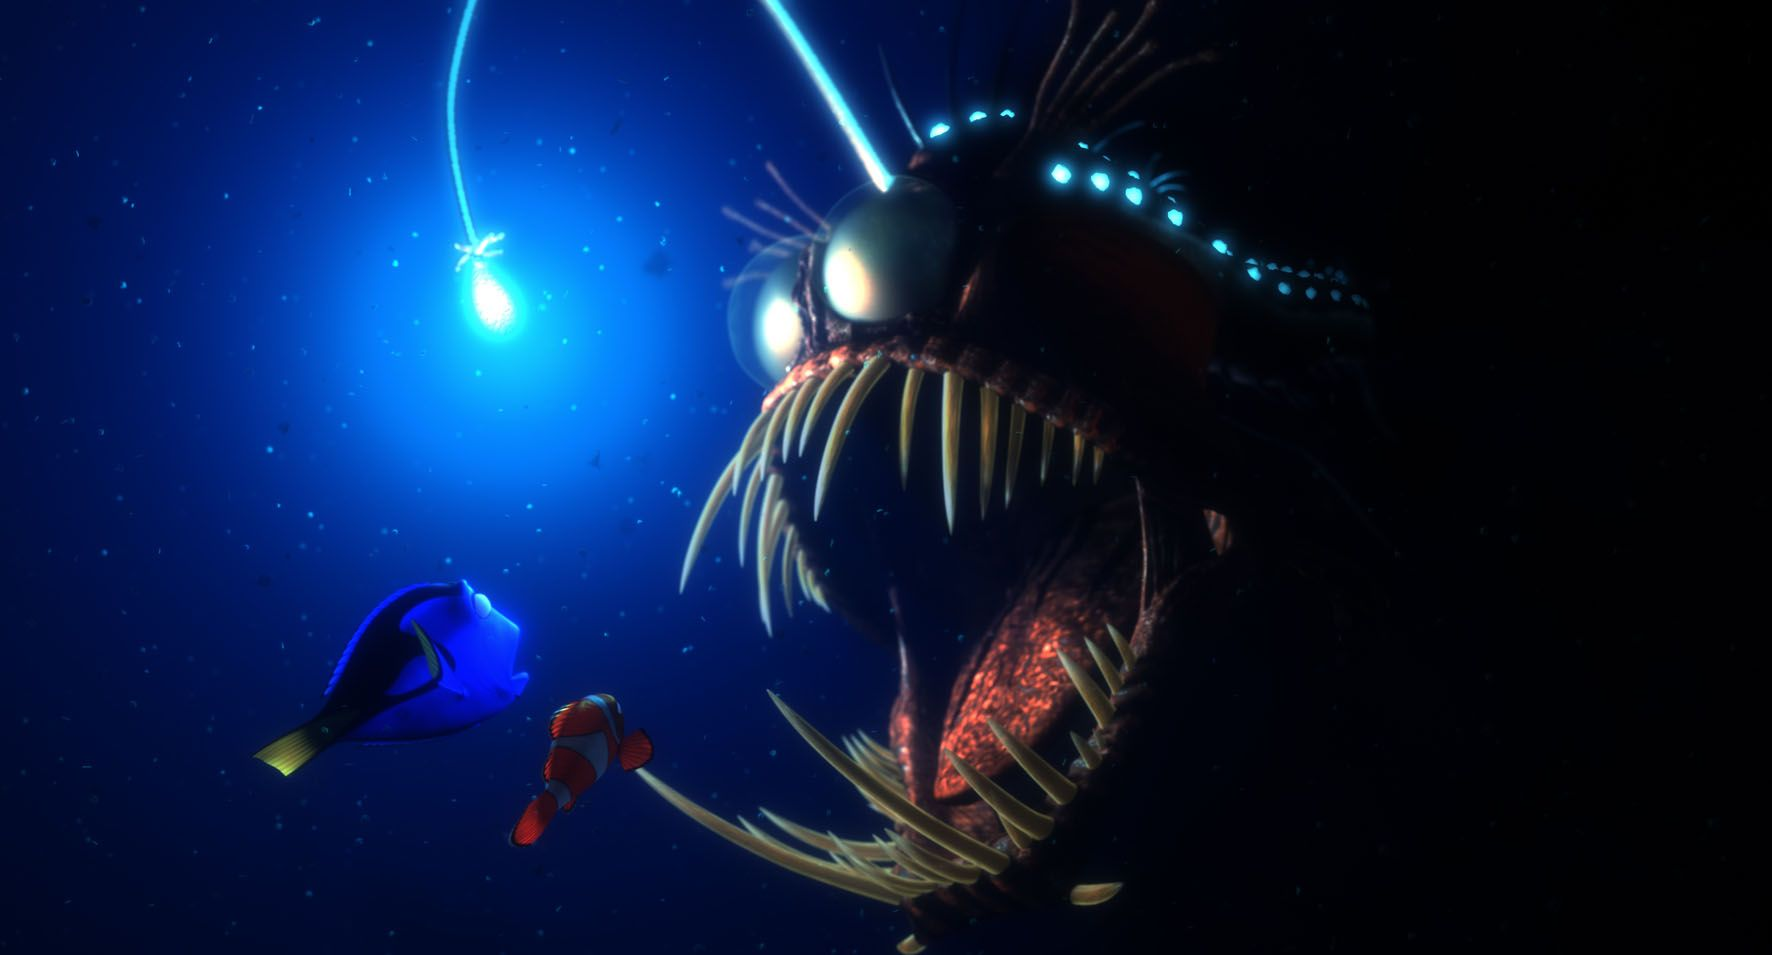 Finding nemo disney pixar movies pinterest finding for Finding nemo fish